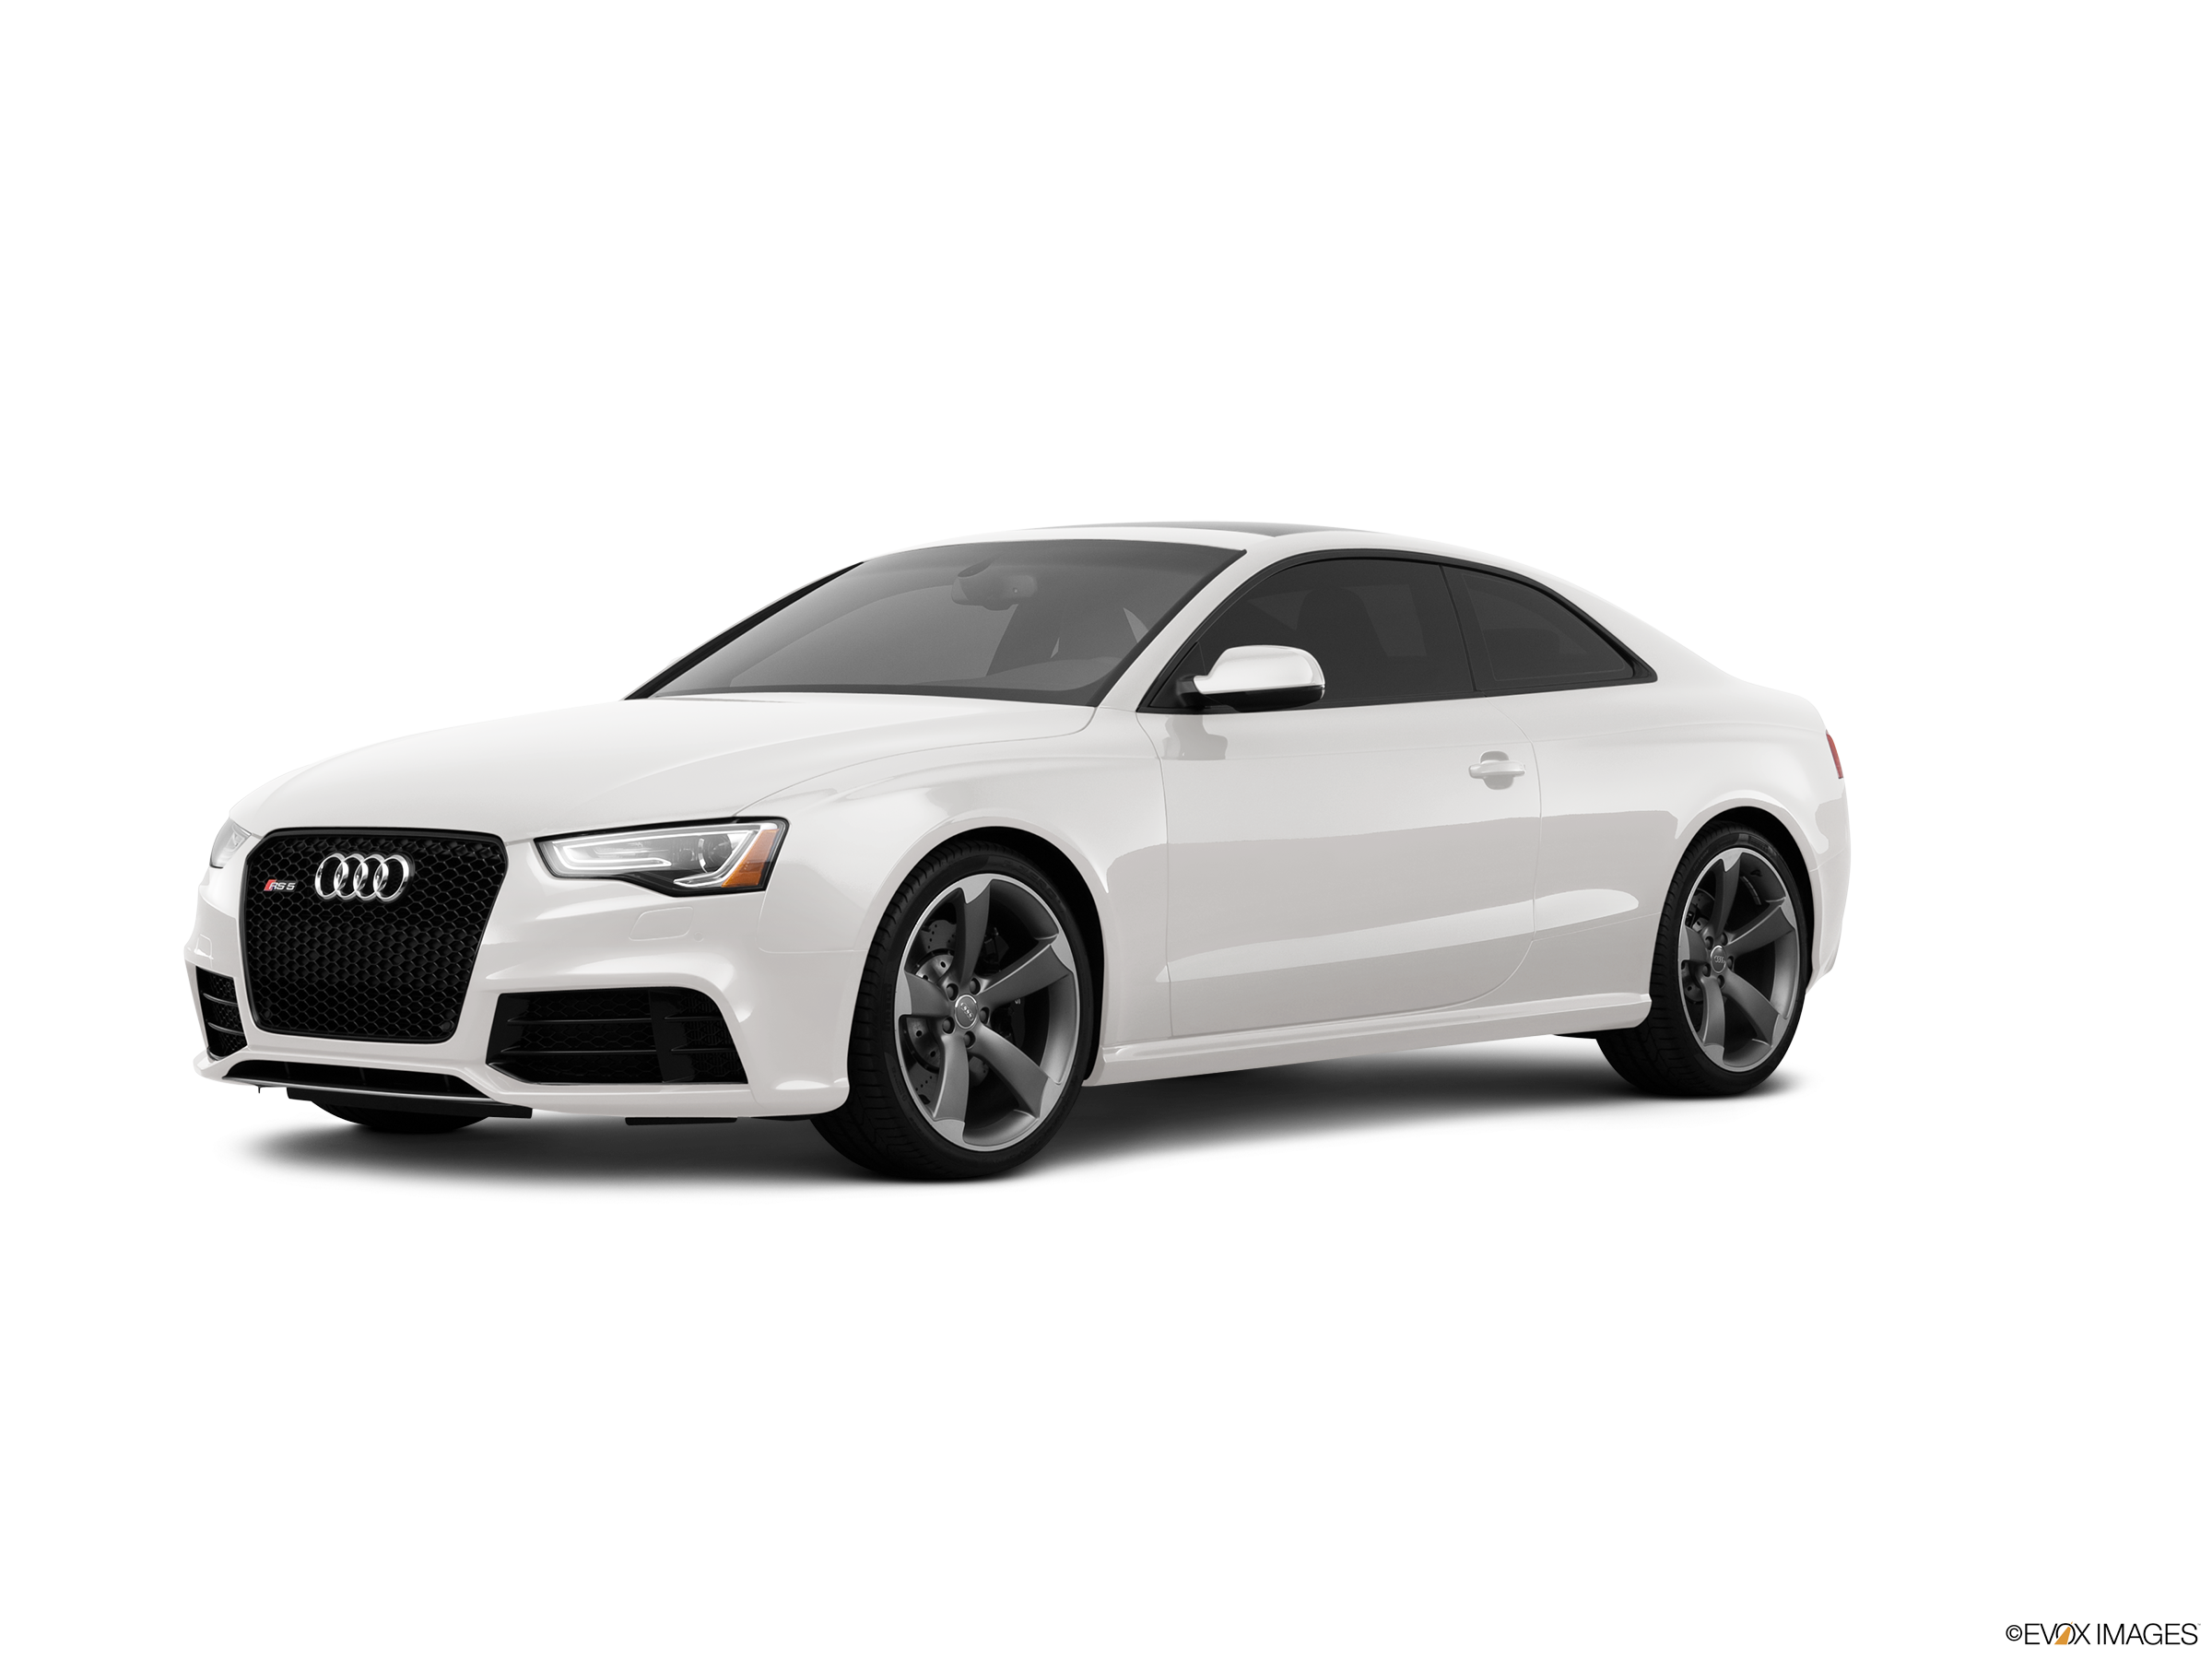 Kekurangan Audi Rs5 2013 Harga